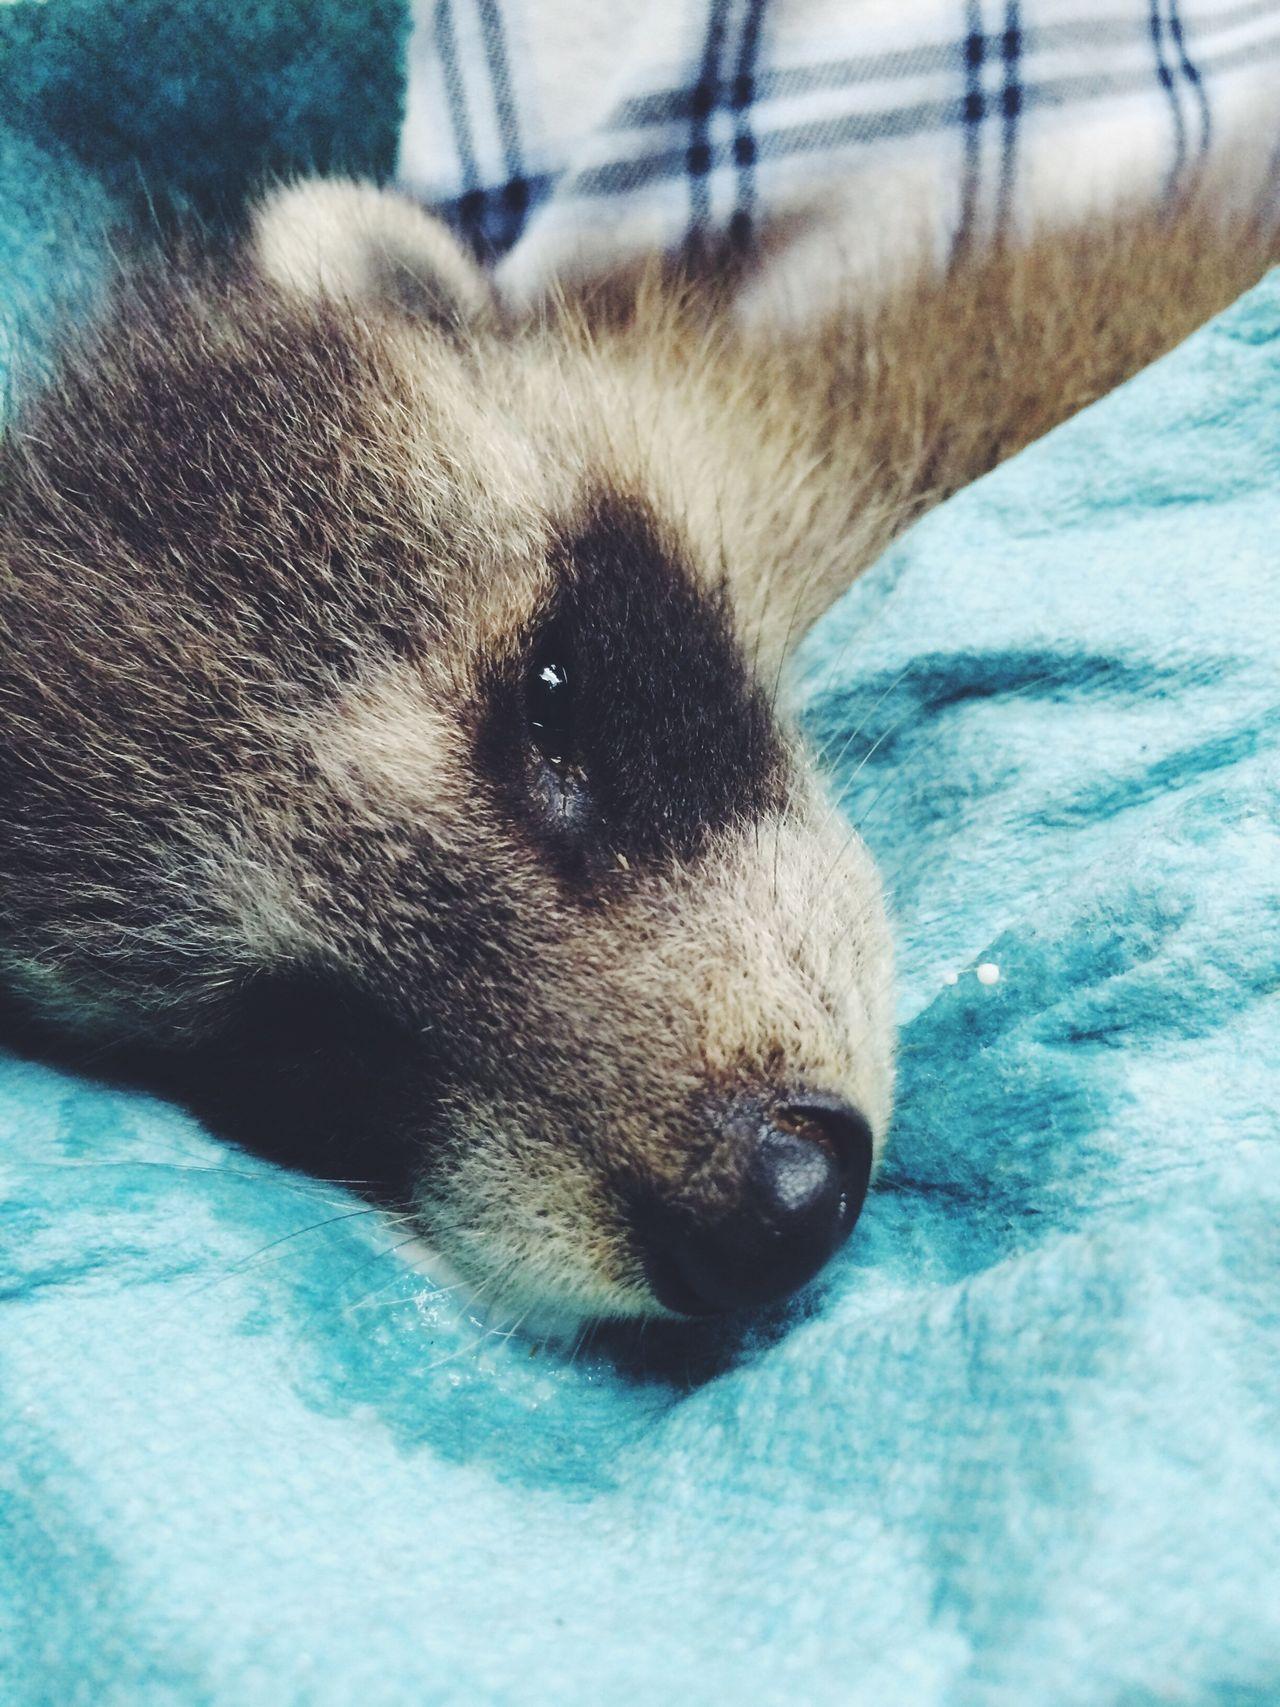 Baby Racoon Racoon Baby Baby Raccoons Nature Wildlife